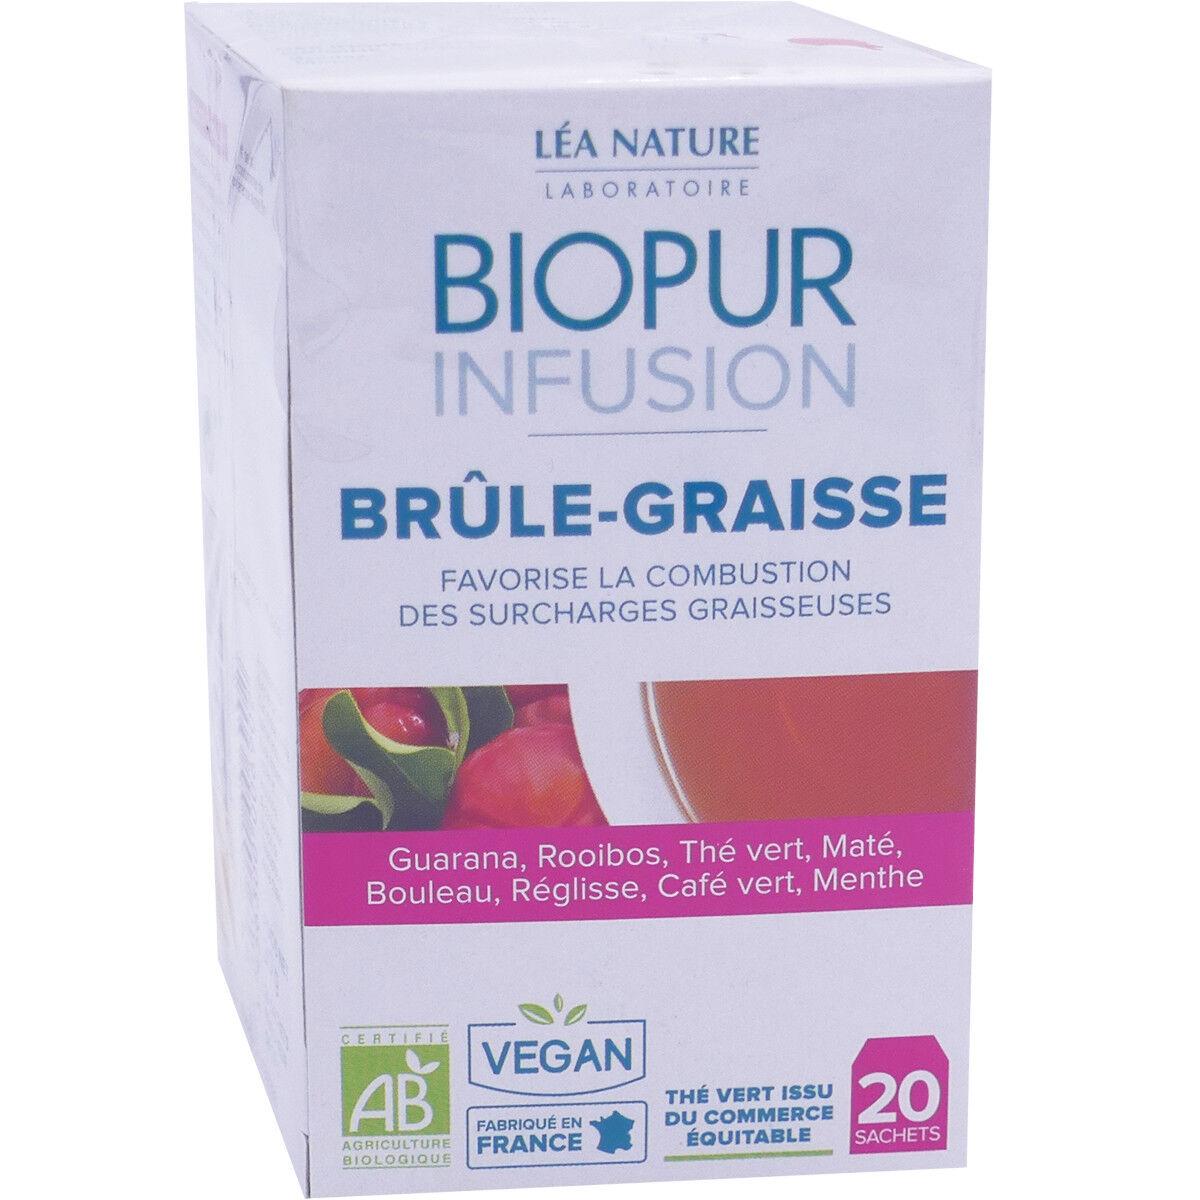 LEA NATURE Biopur infusion brule-graisse 20 sachets bio